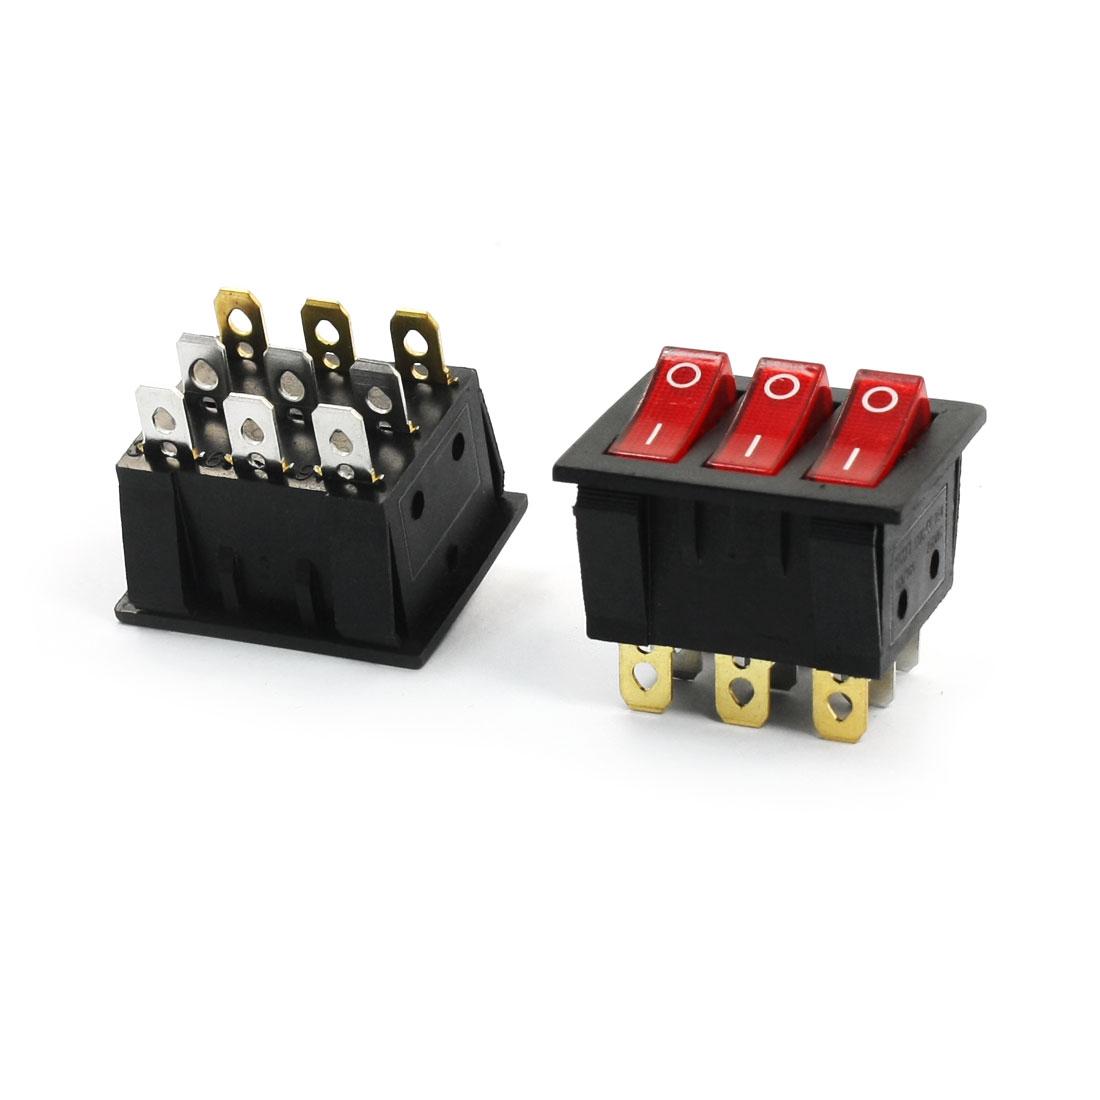 2Pcs AC250V 16A 3 Way Red Pilot Lamp Three SPST Rocker Switches